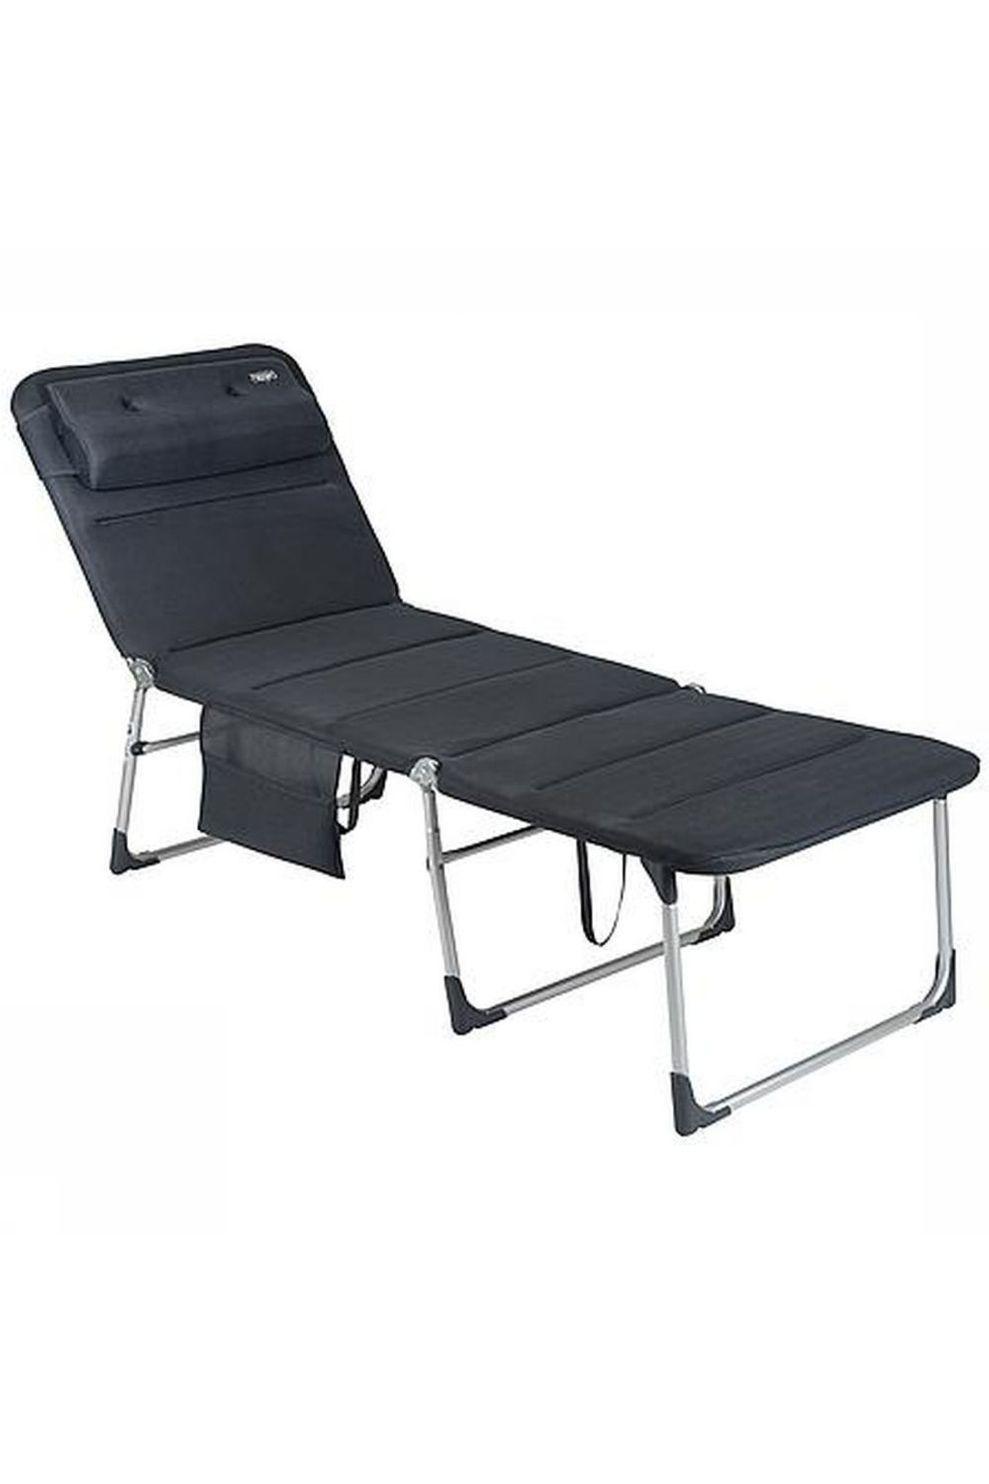 Crespo Relaxstoel Aa-363 Air-Elite - Grijs